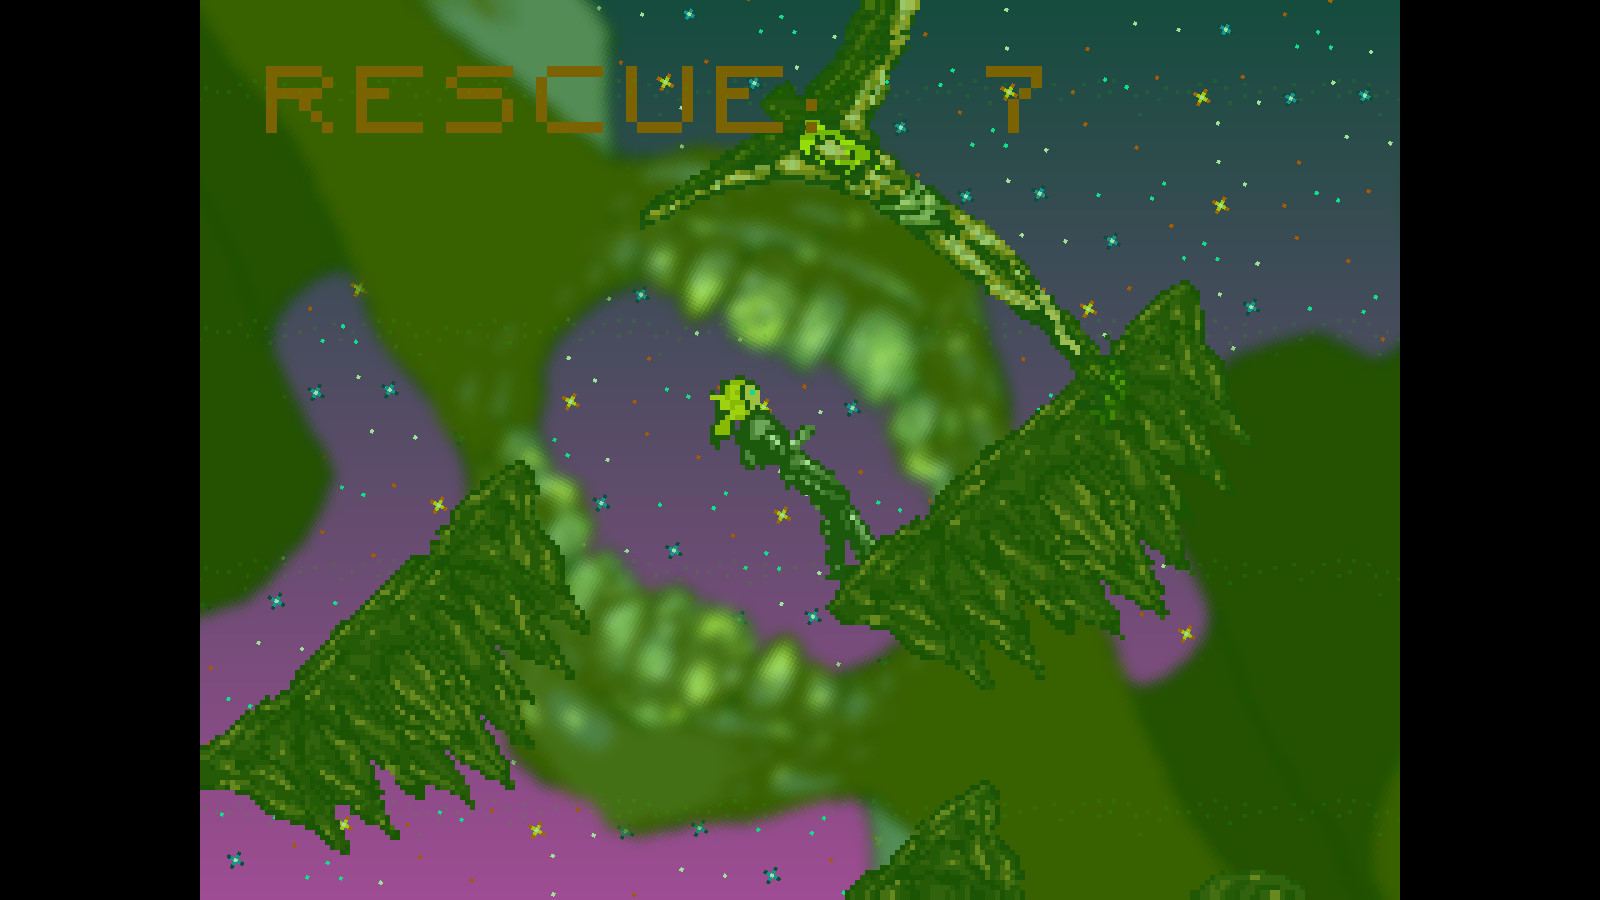 Uriel's Chasm screenshot